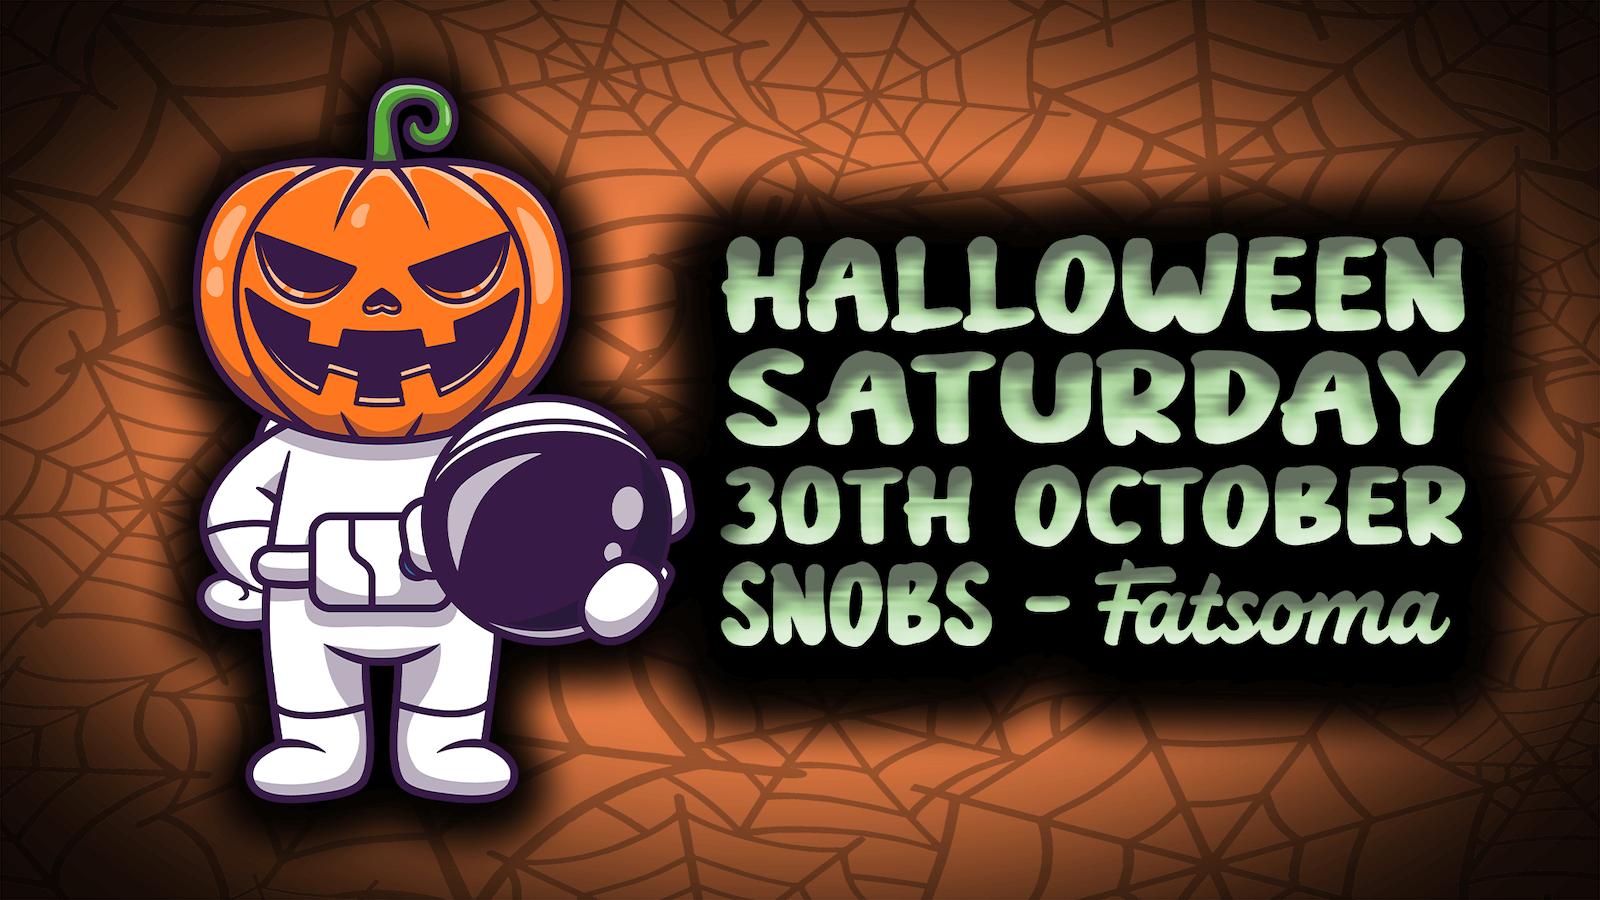 Halloween Loaded Saturday 30th October